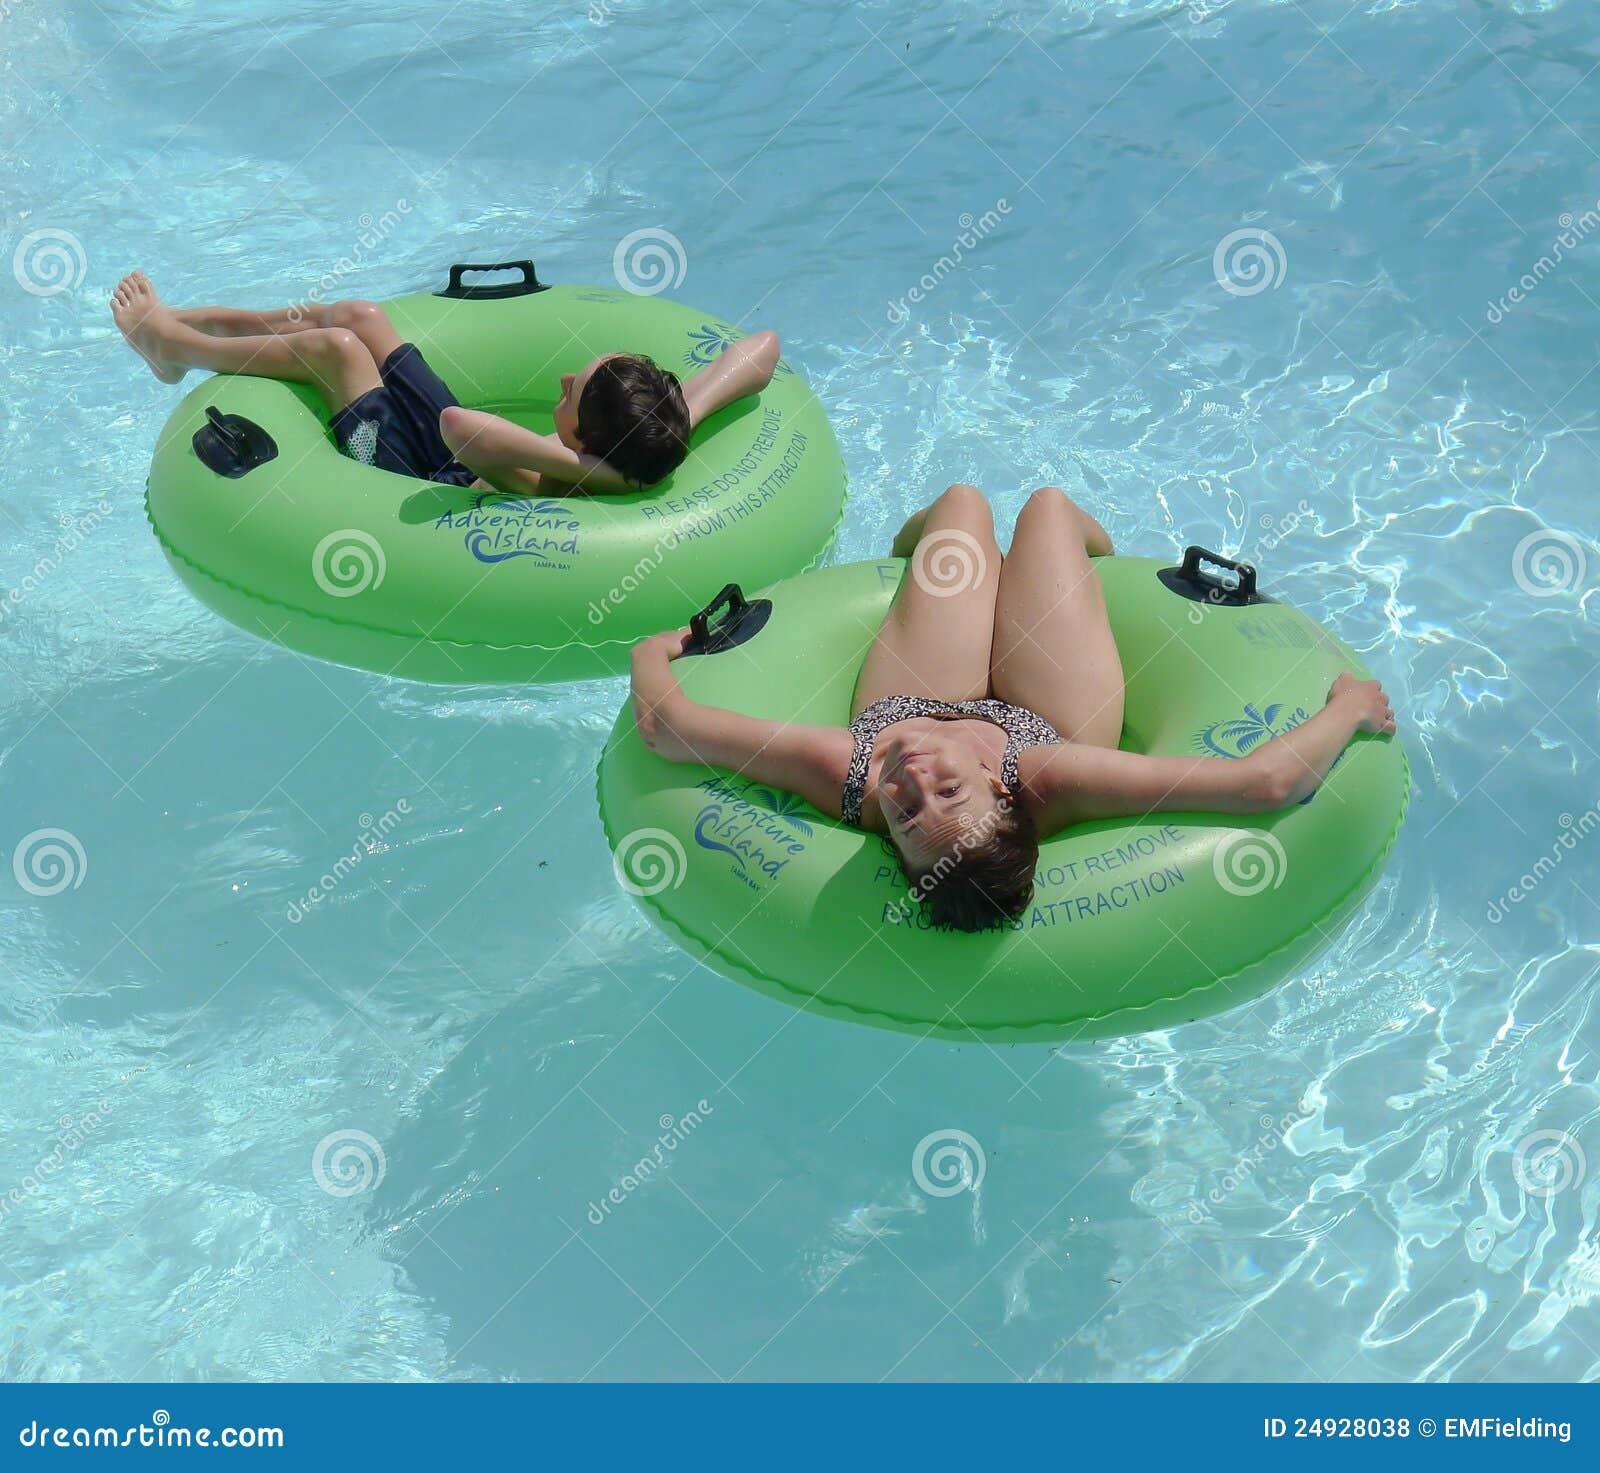 Lazy River At Adventure Island Tampa Bay Editorial Stock Photo Image 24928038